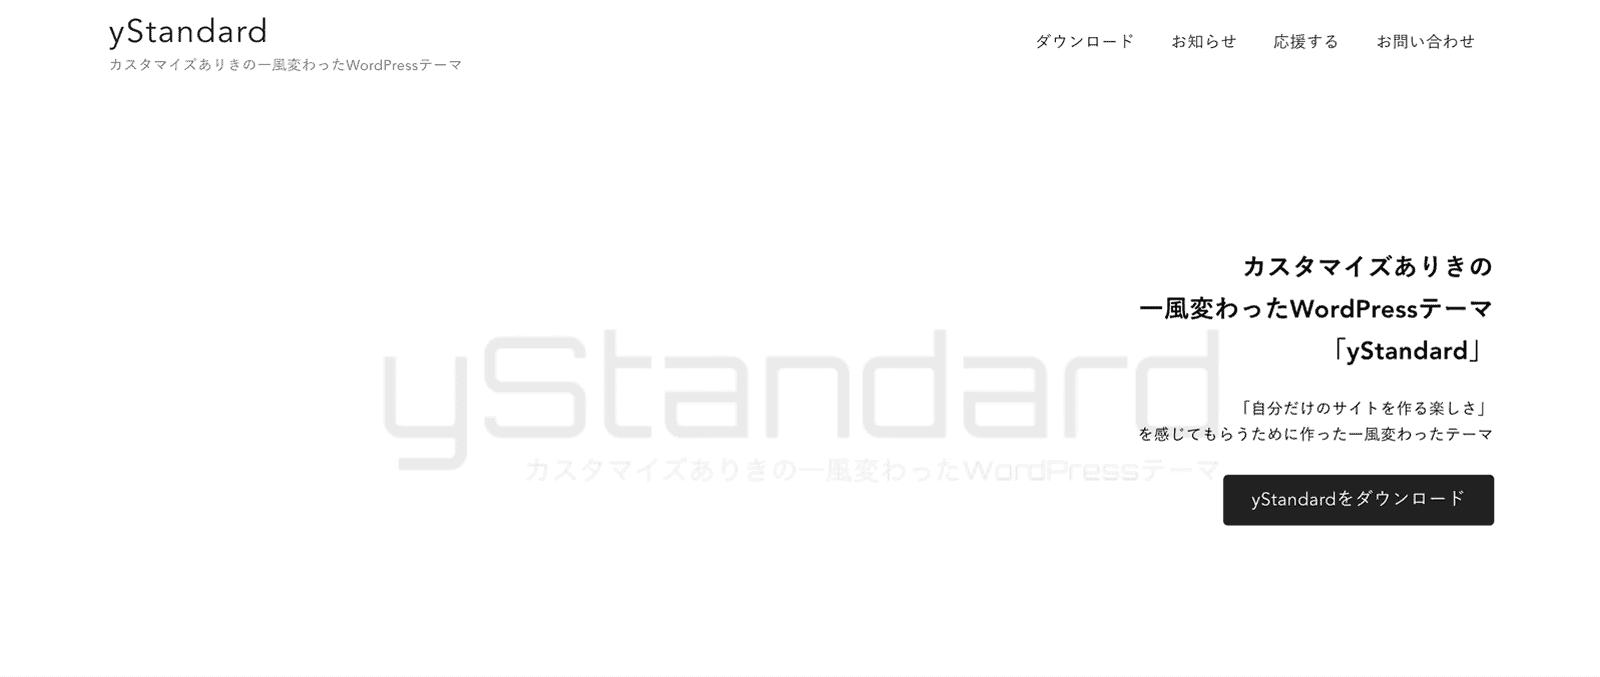 yStandard v3.0.0公開!v2系からのアップグレード方法や注意点など